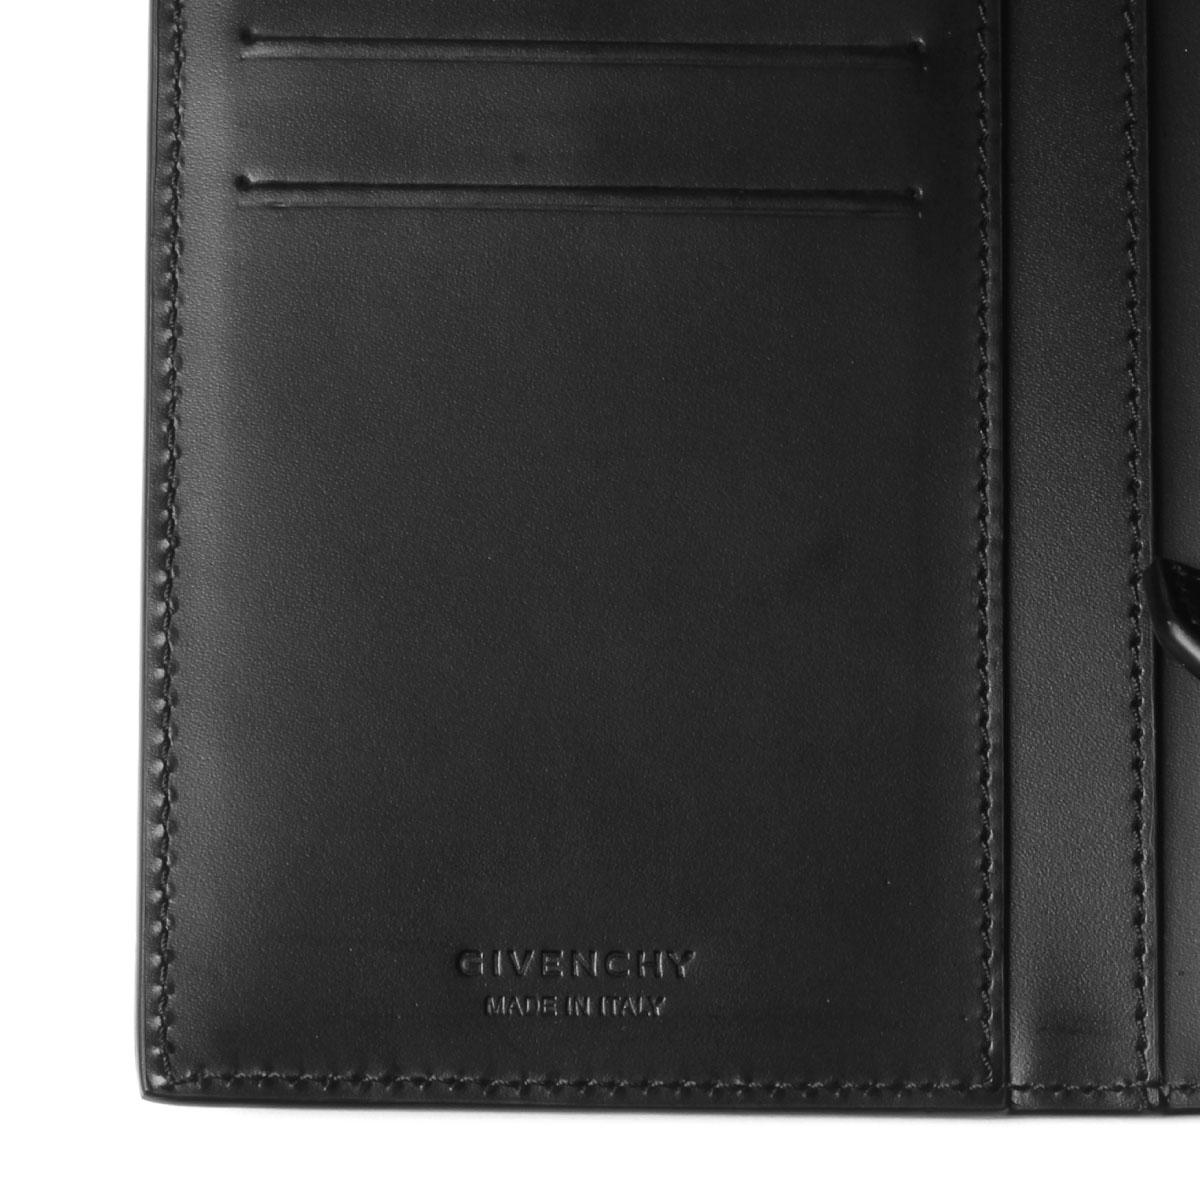 6df1b313 Givenchy GIVENCHY wallet men BK600KK0EA 004 folio long wallet BLACK/WHITE  black